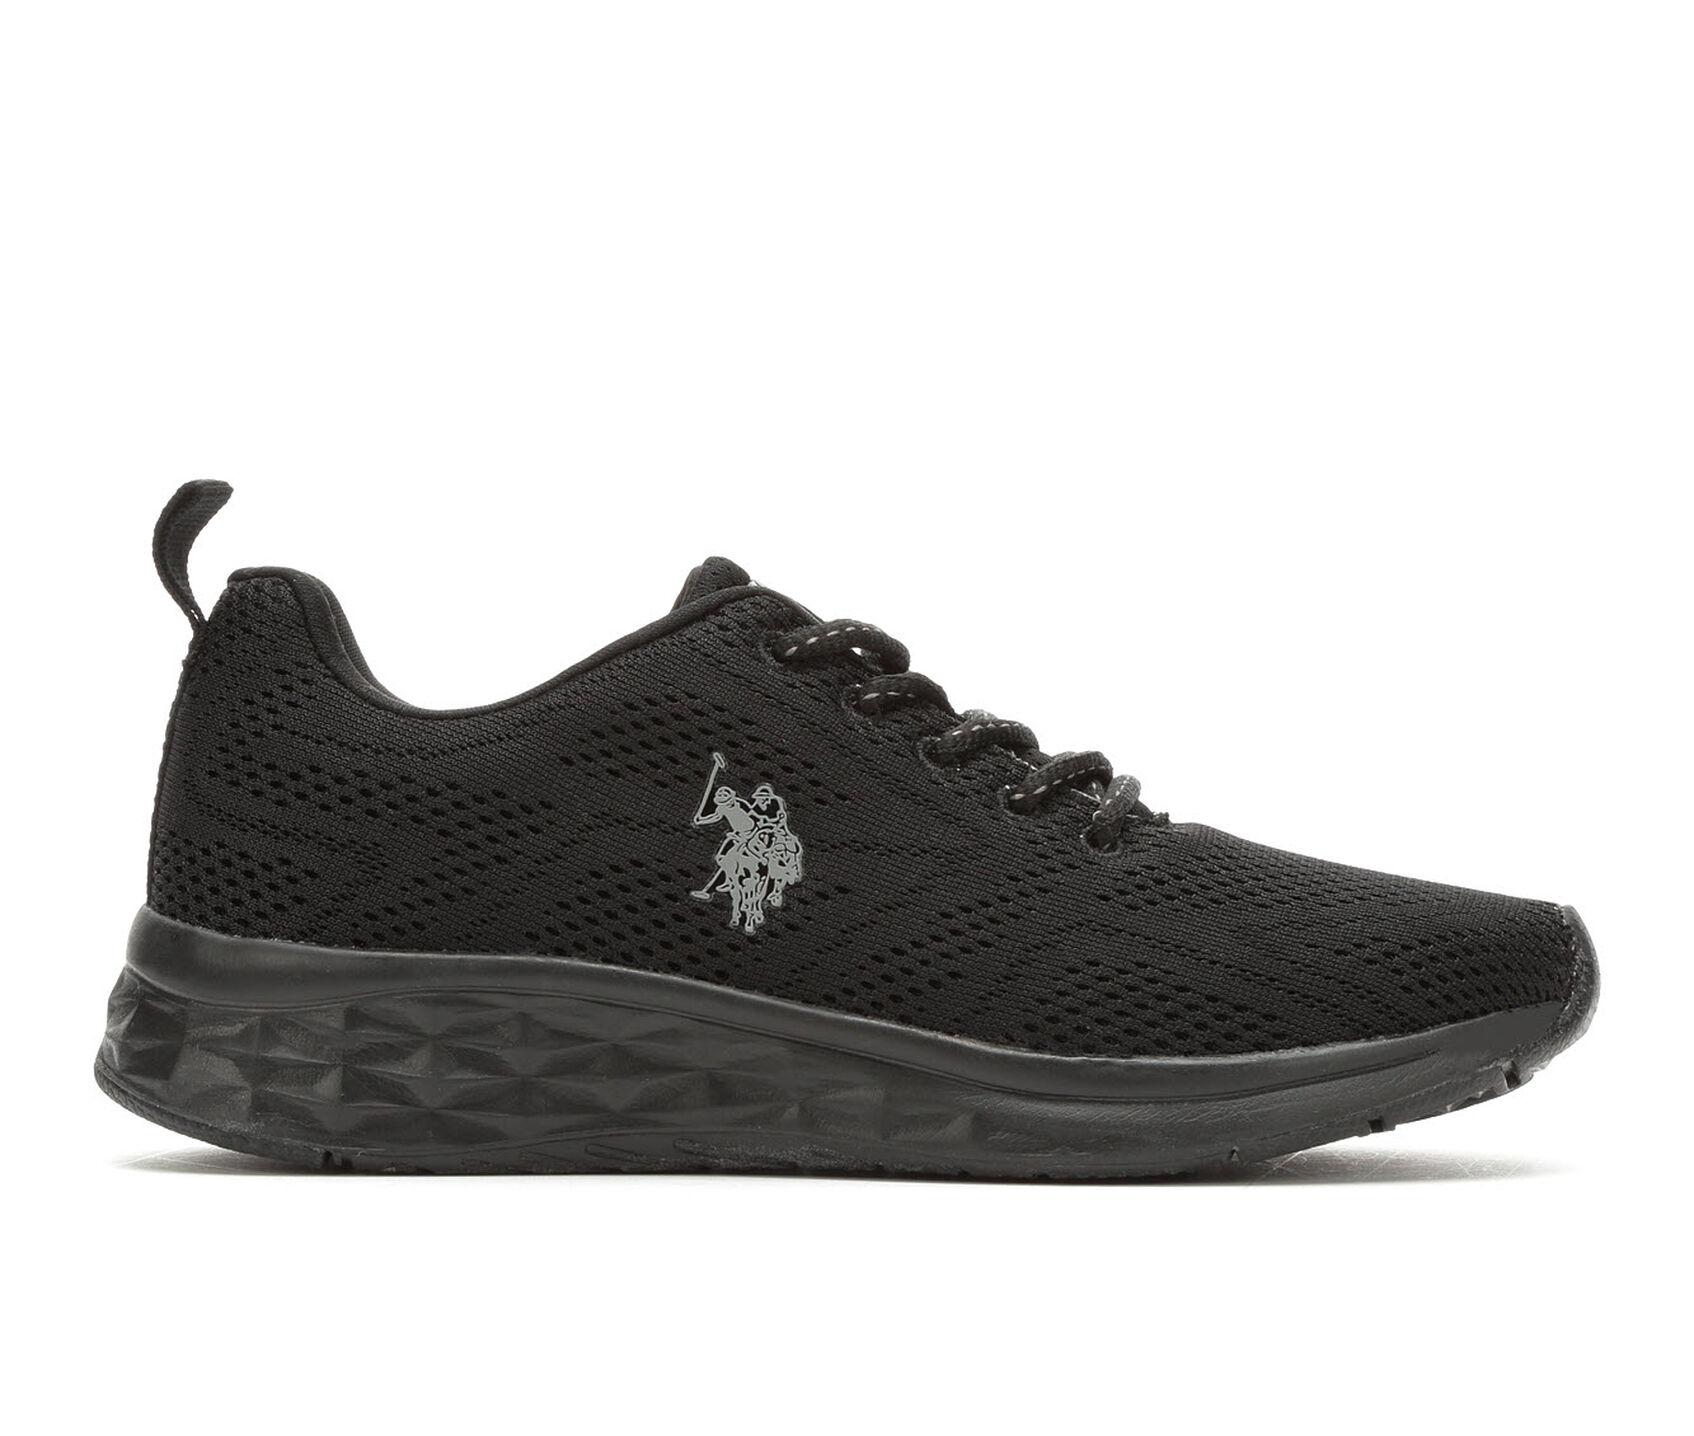 d6355c37399 Women's US Polo Assn Anita Sneakers